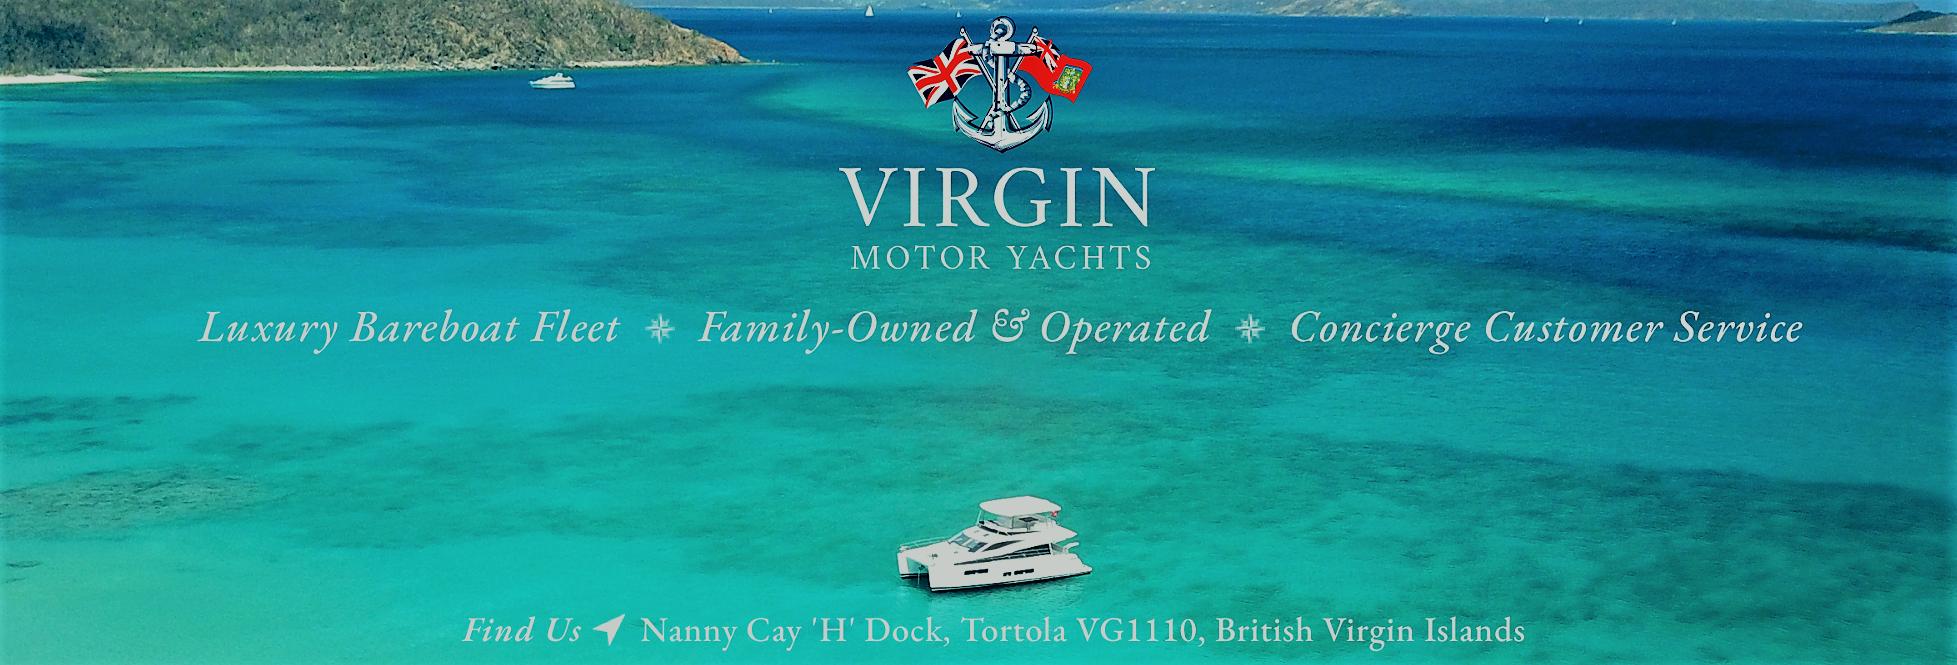 Virgin Charter Yachts